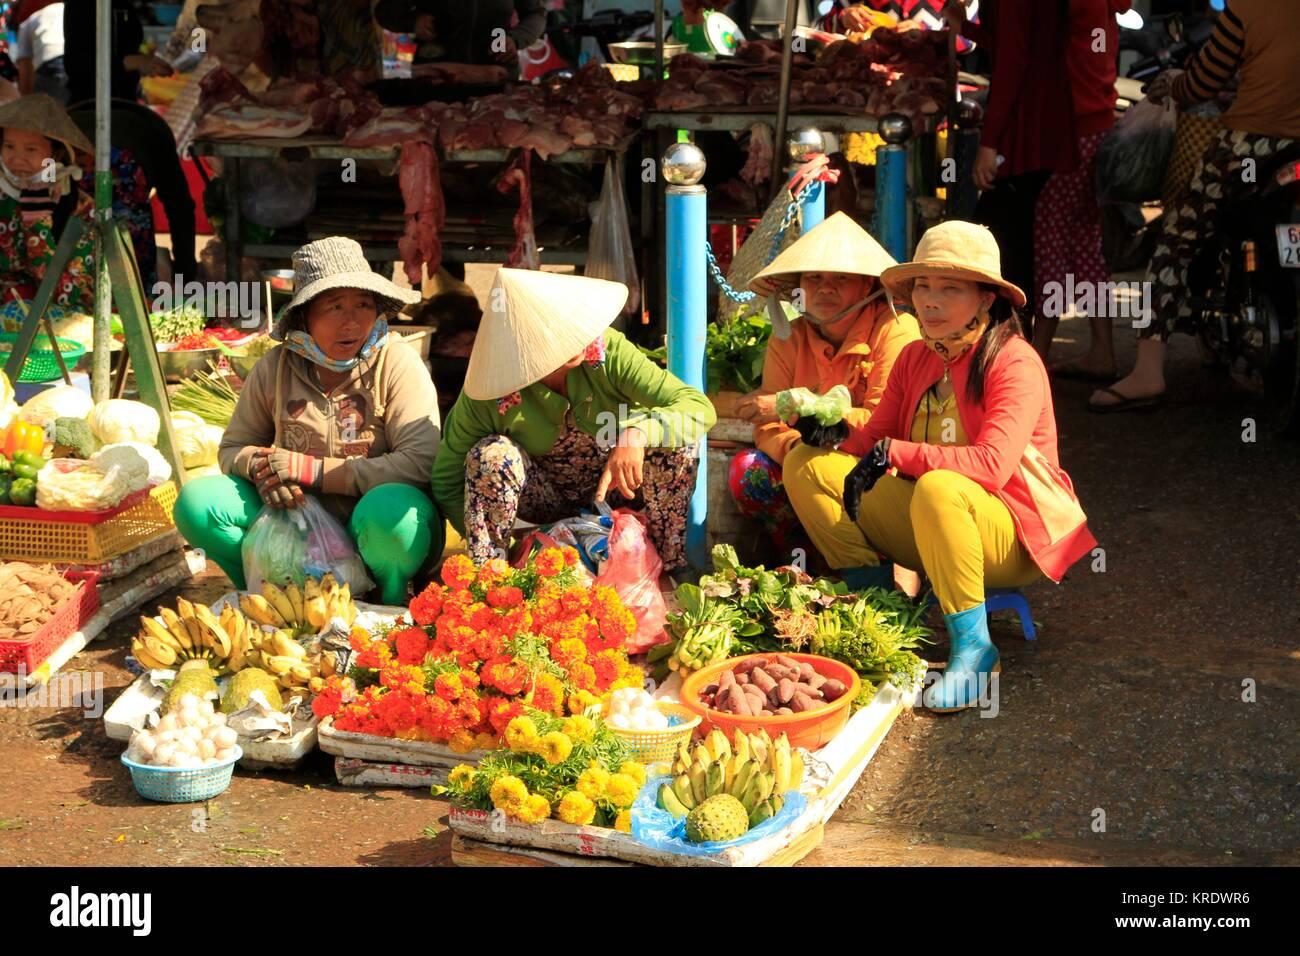 Duong Dong Market, Phu Quoc Island, Vietnam - Stock Image